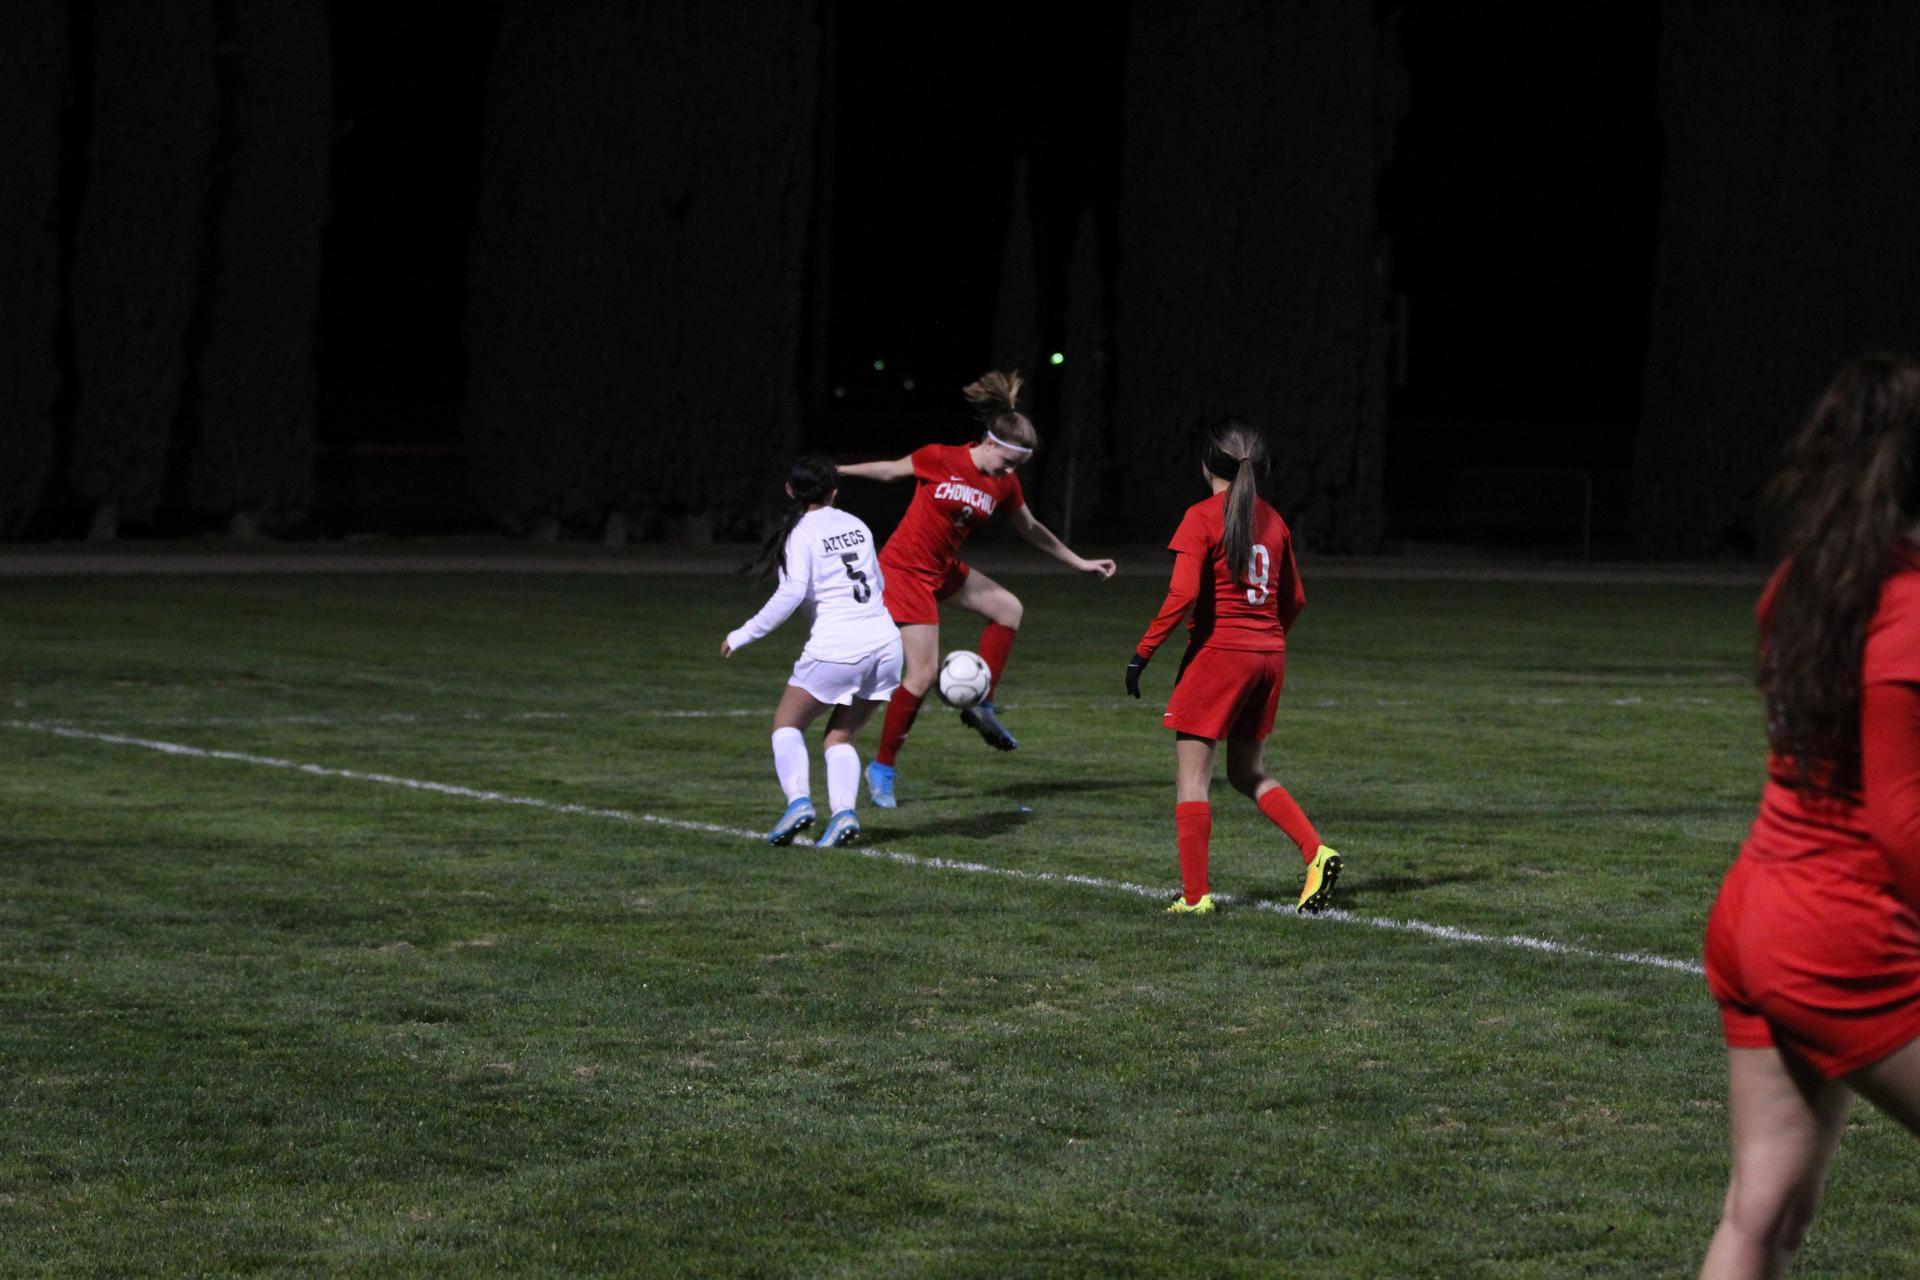 Girls playing soccer